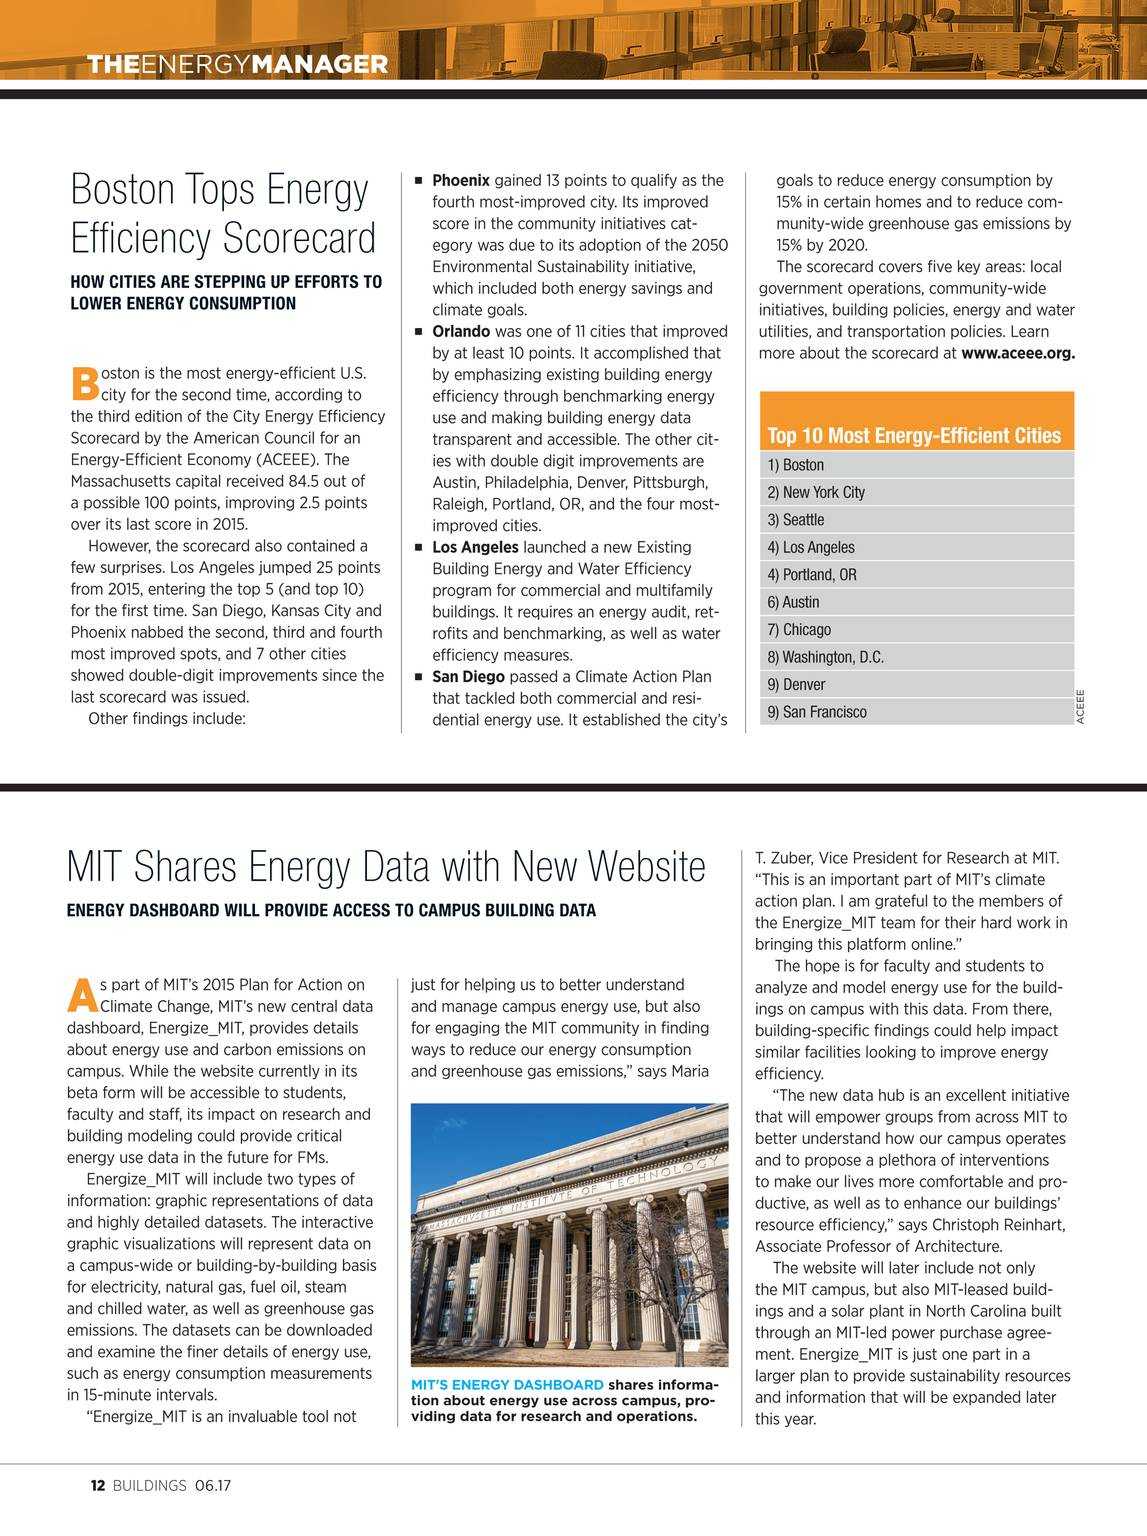 Buildings Magazine - June 2017 - page 13